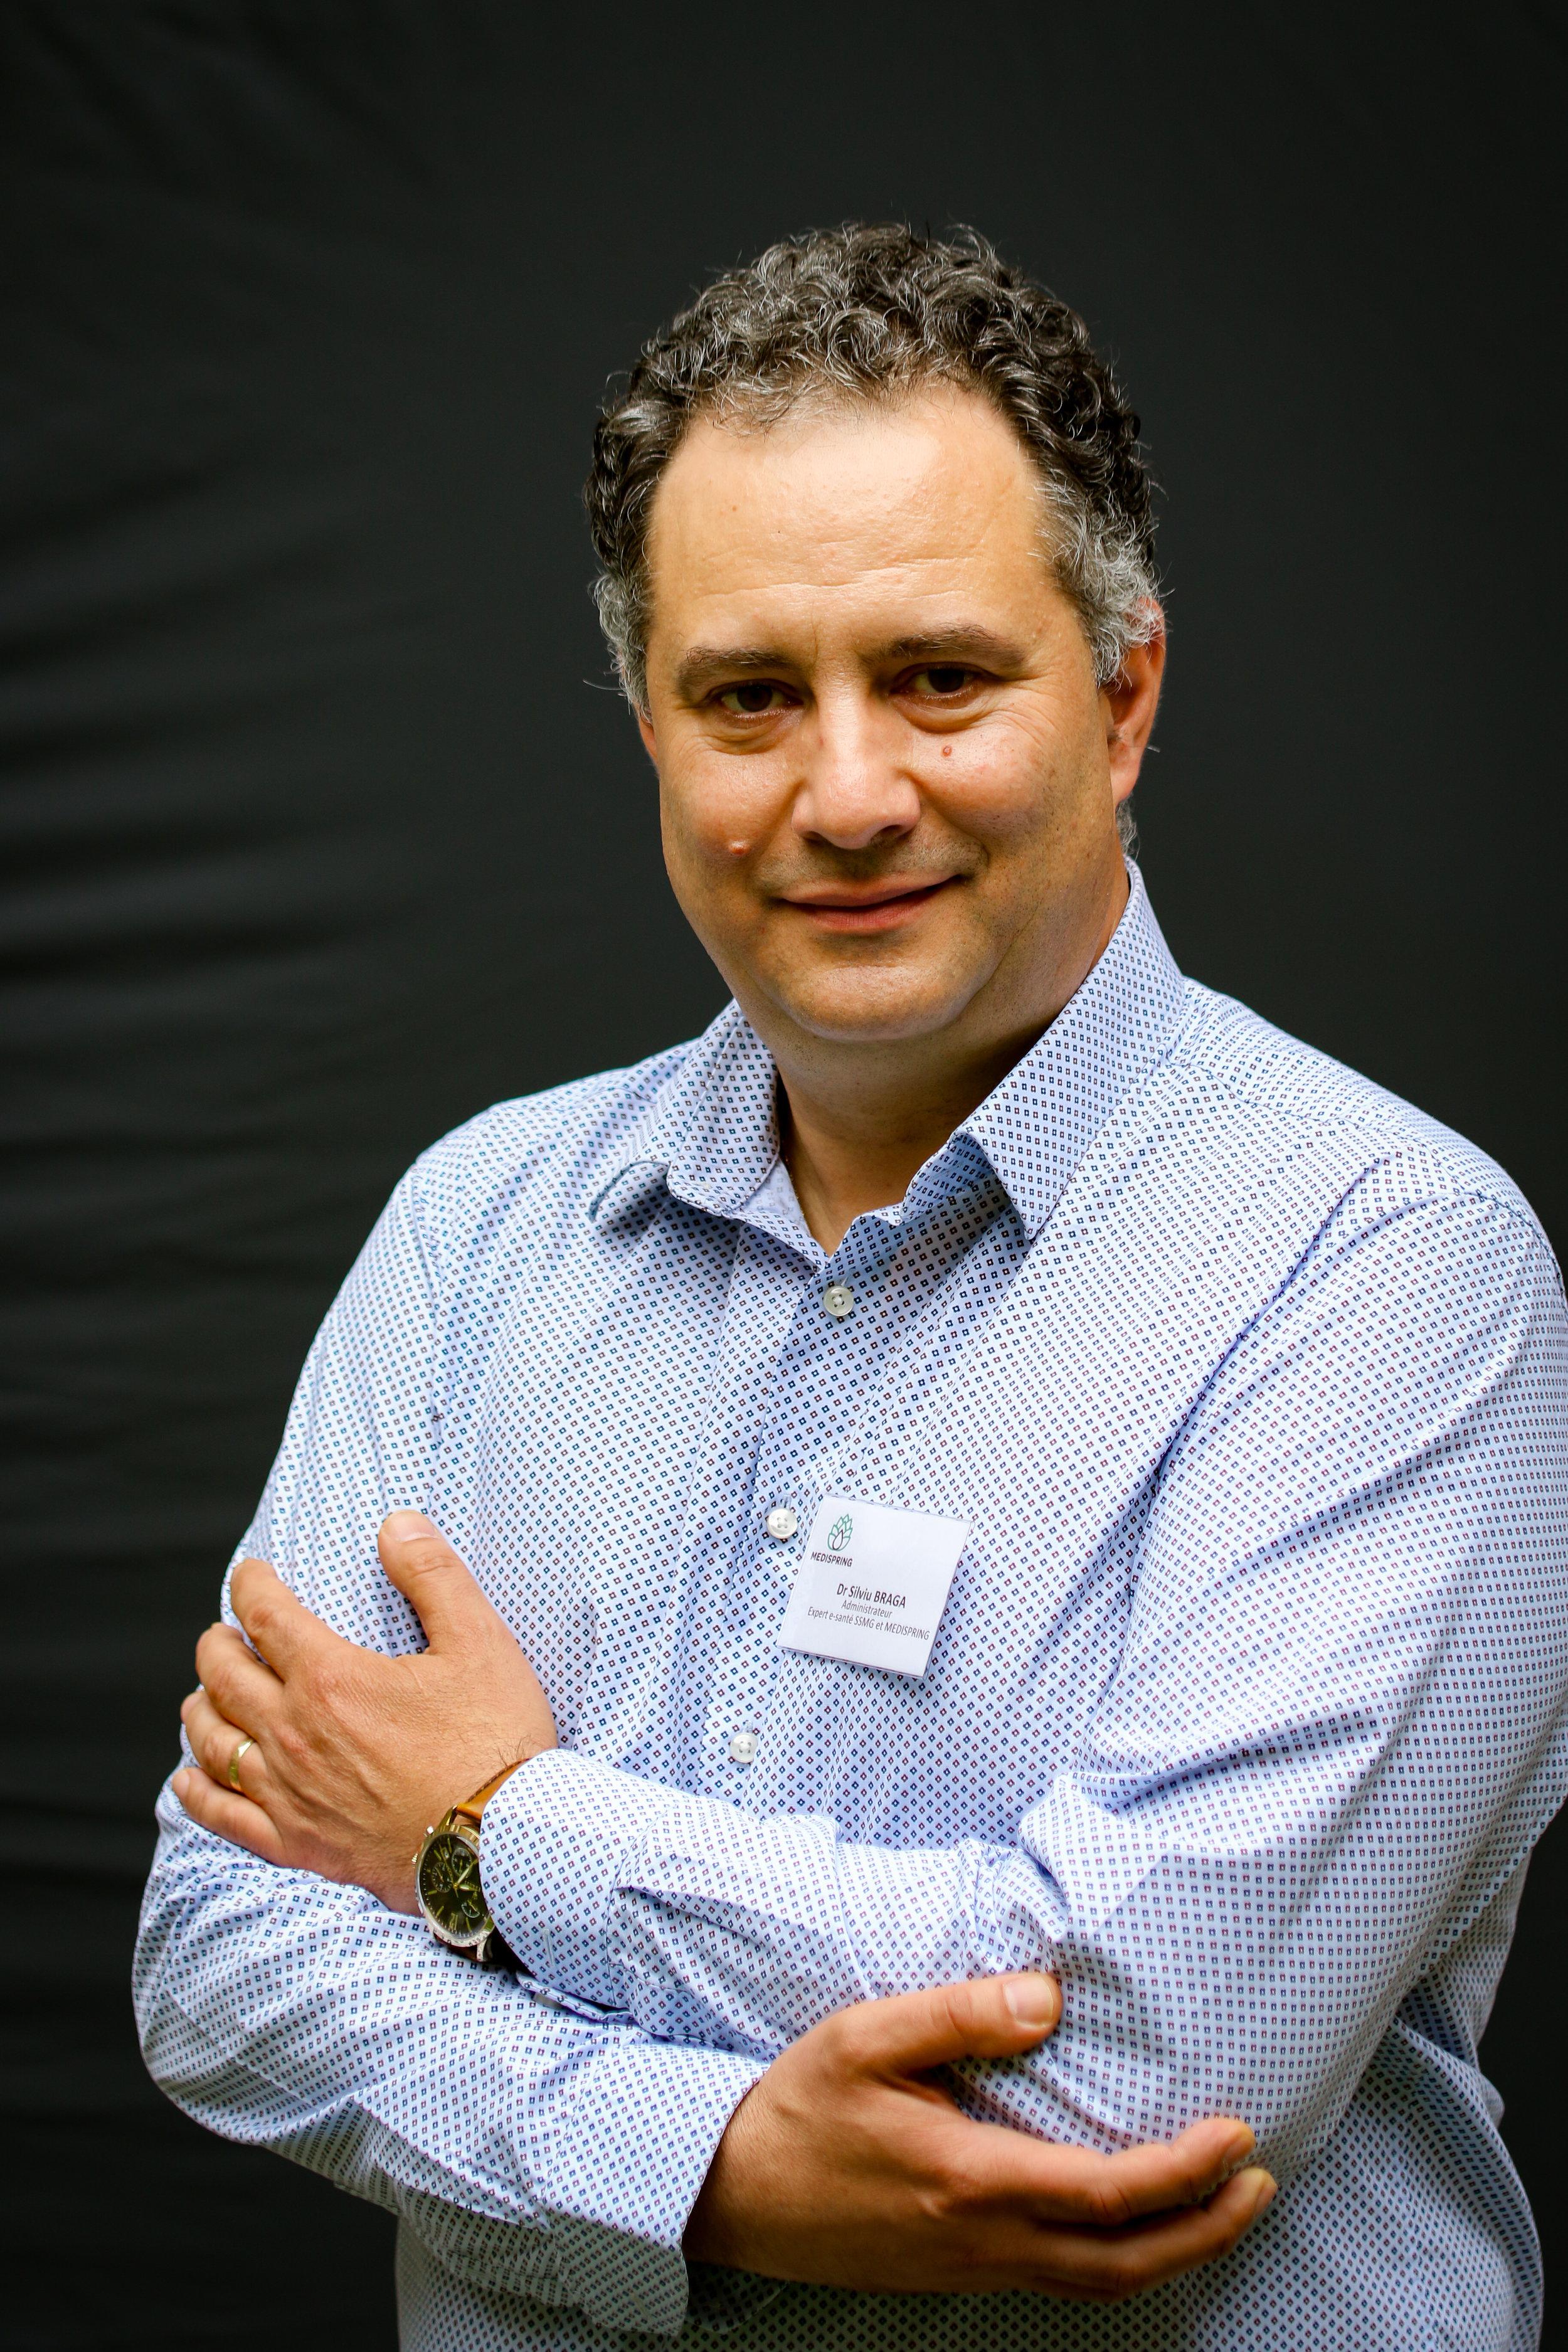 Dr. Silviu Braga